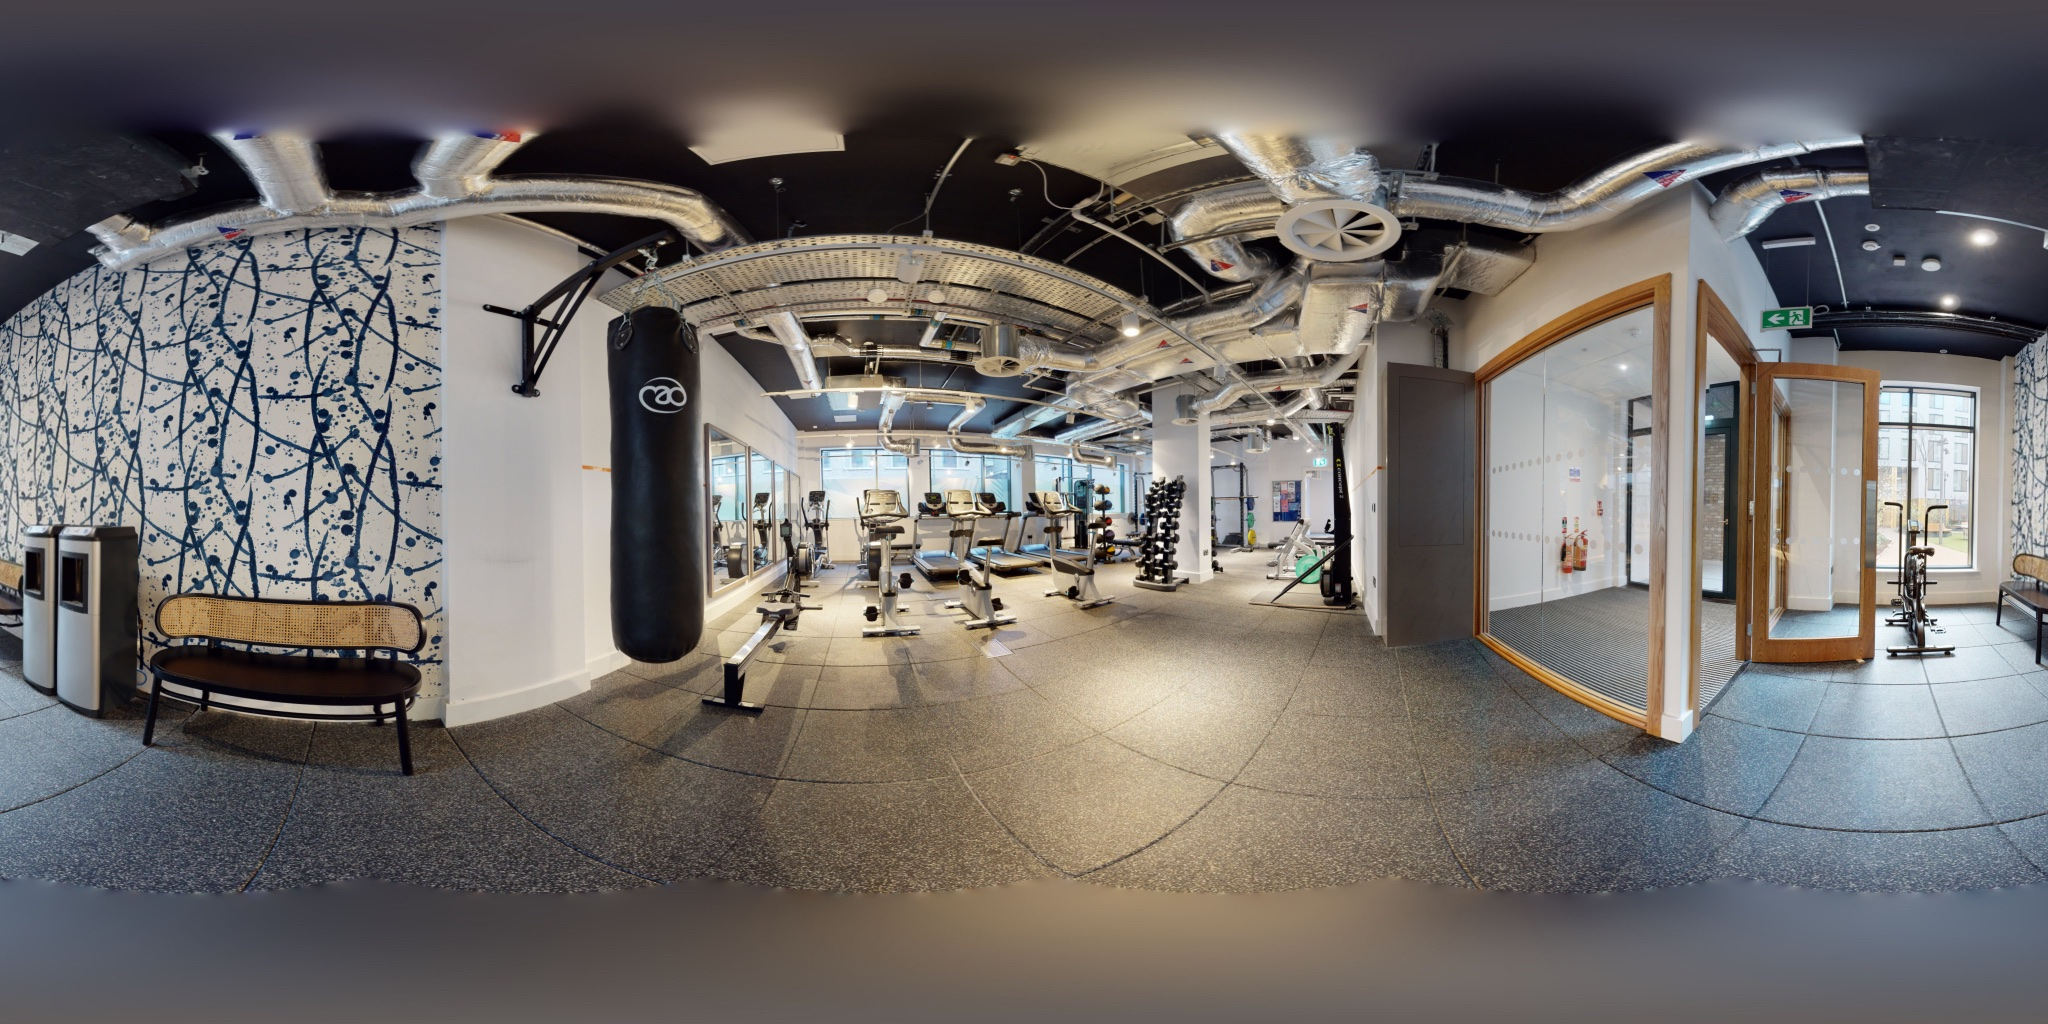 Student Residence Accommodation 360° Virtual Tour Experience Ireland